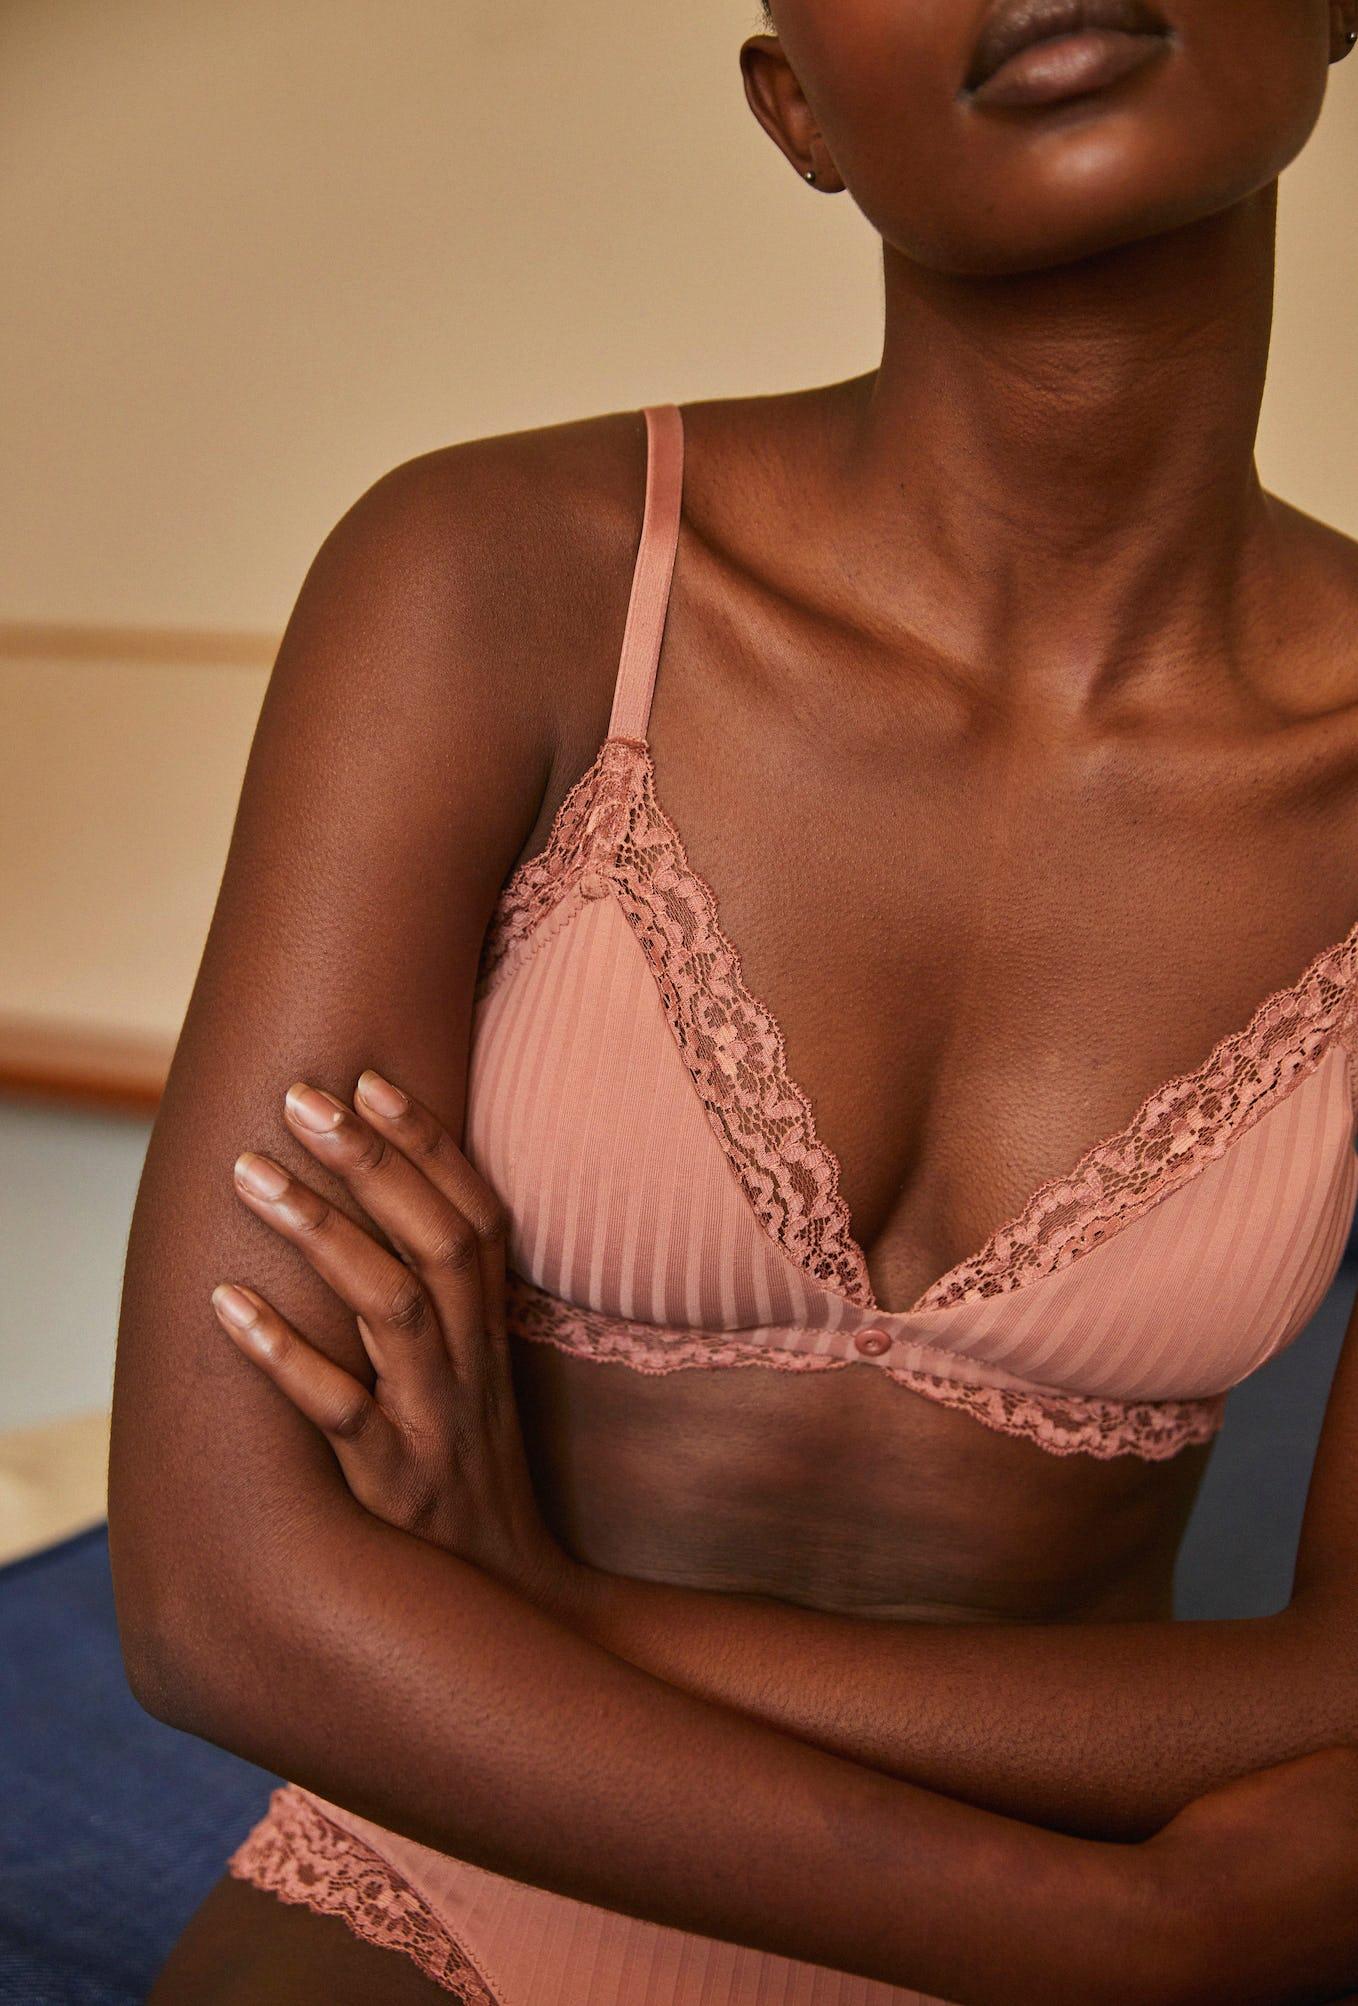 triangle contre mon corps moka